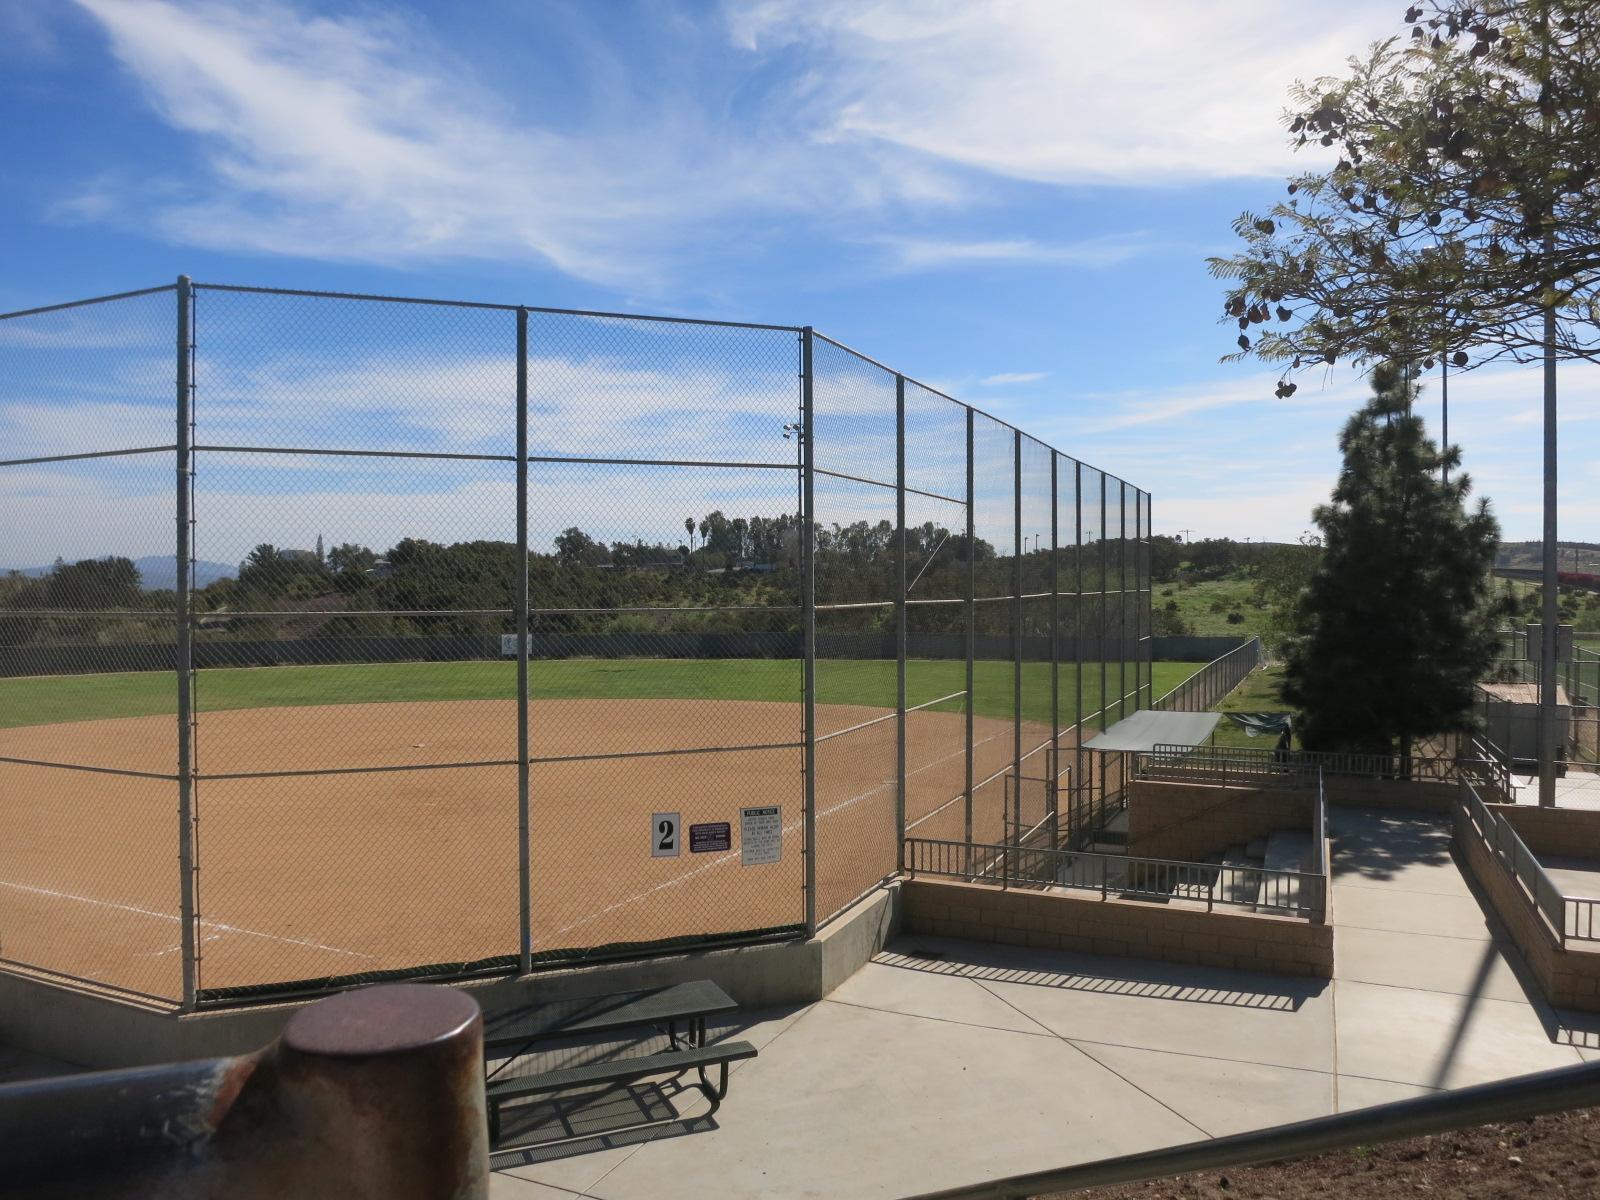 Backstop dirt field 1.JPG